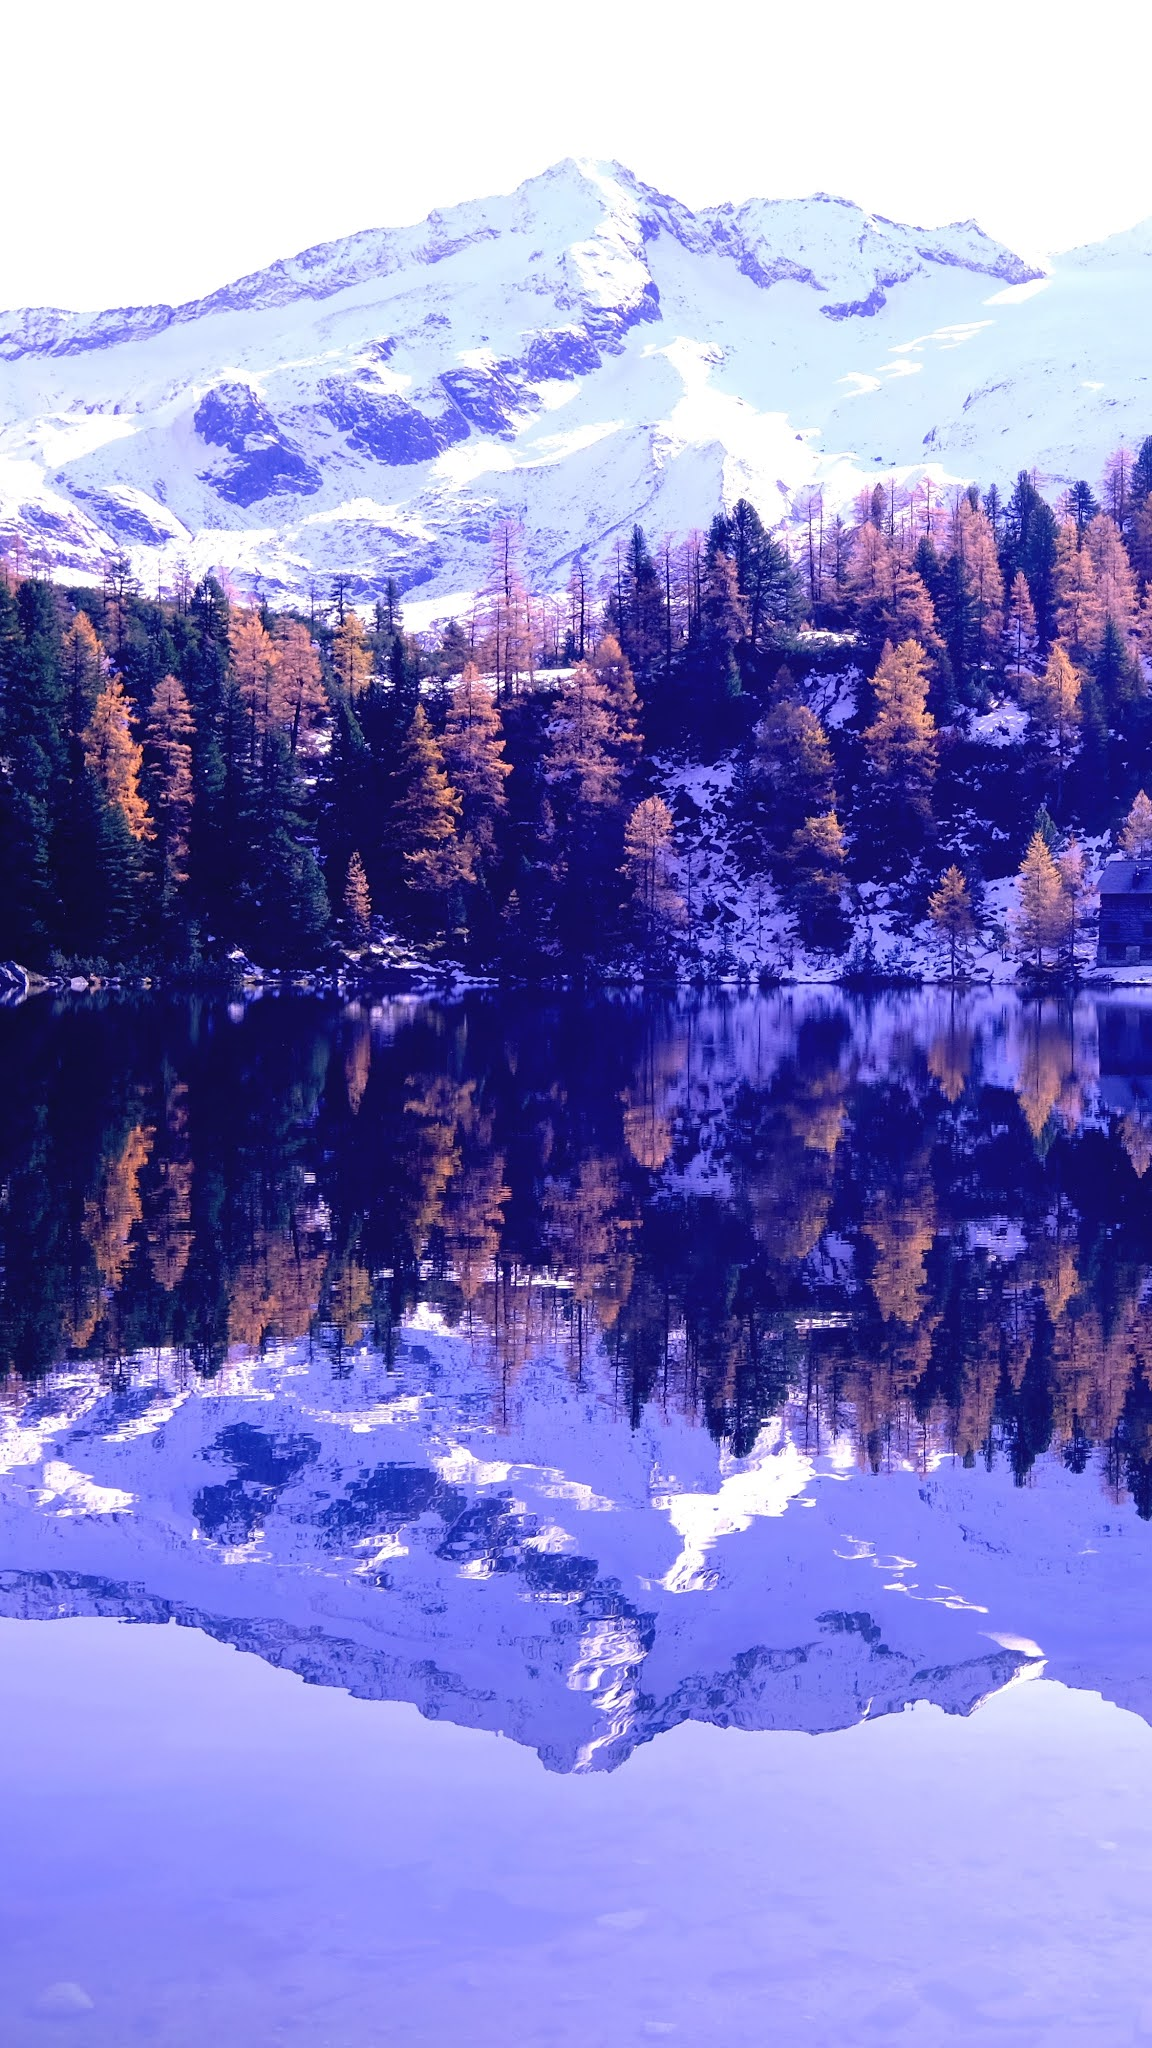 winter-landscape-wallpaper-4k-for-phone